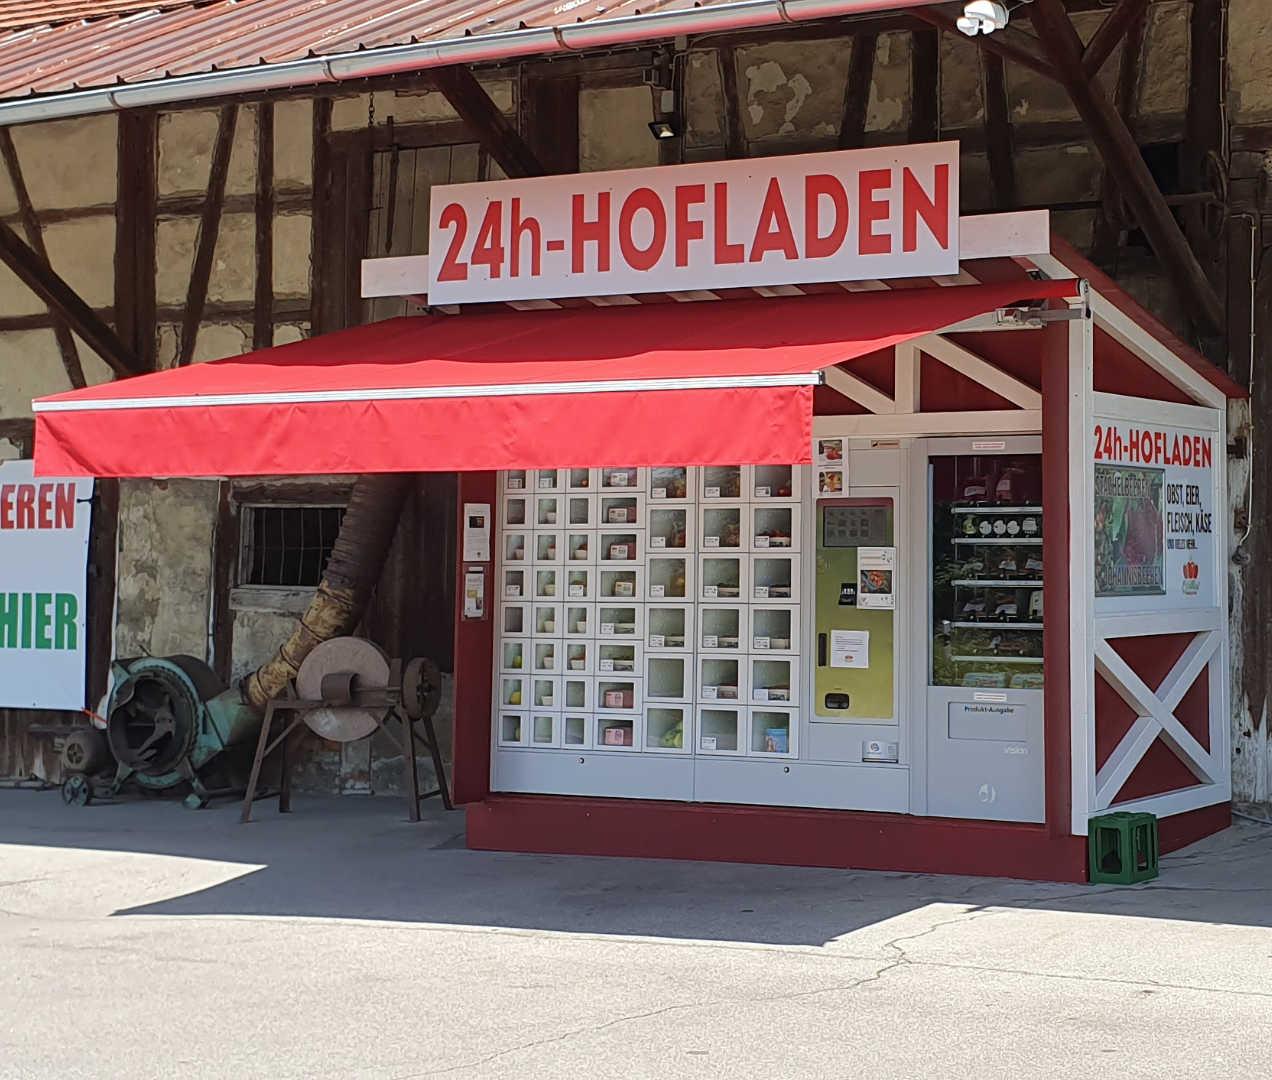 Bild website - 24h Hofladen Lebensmittelautomat